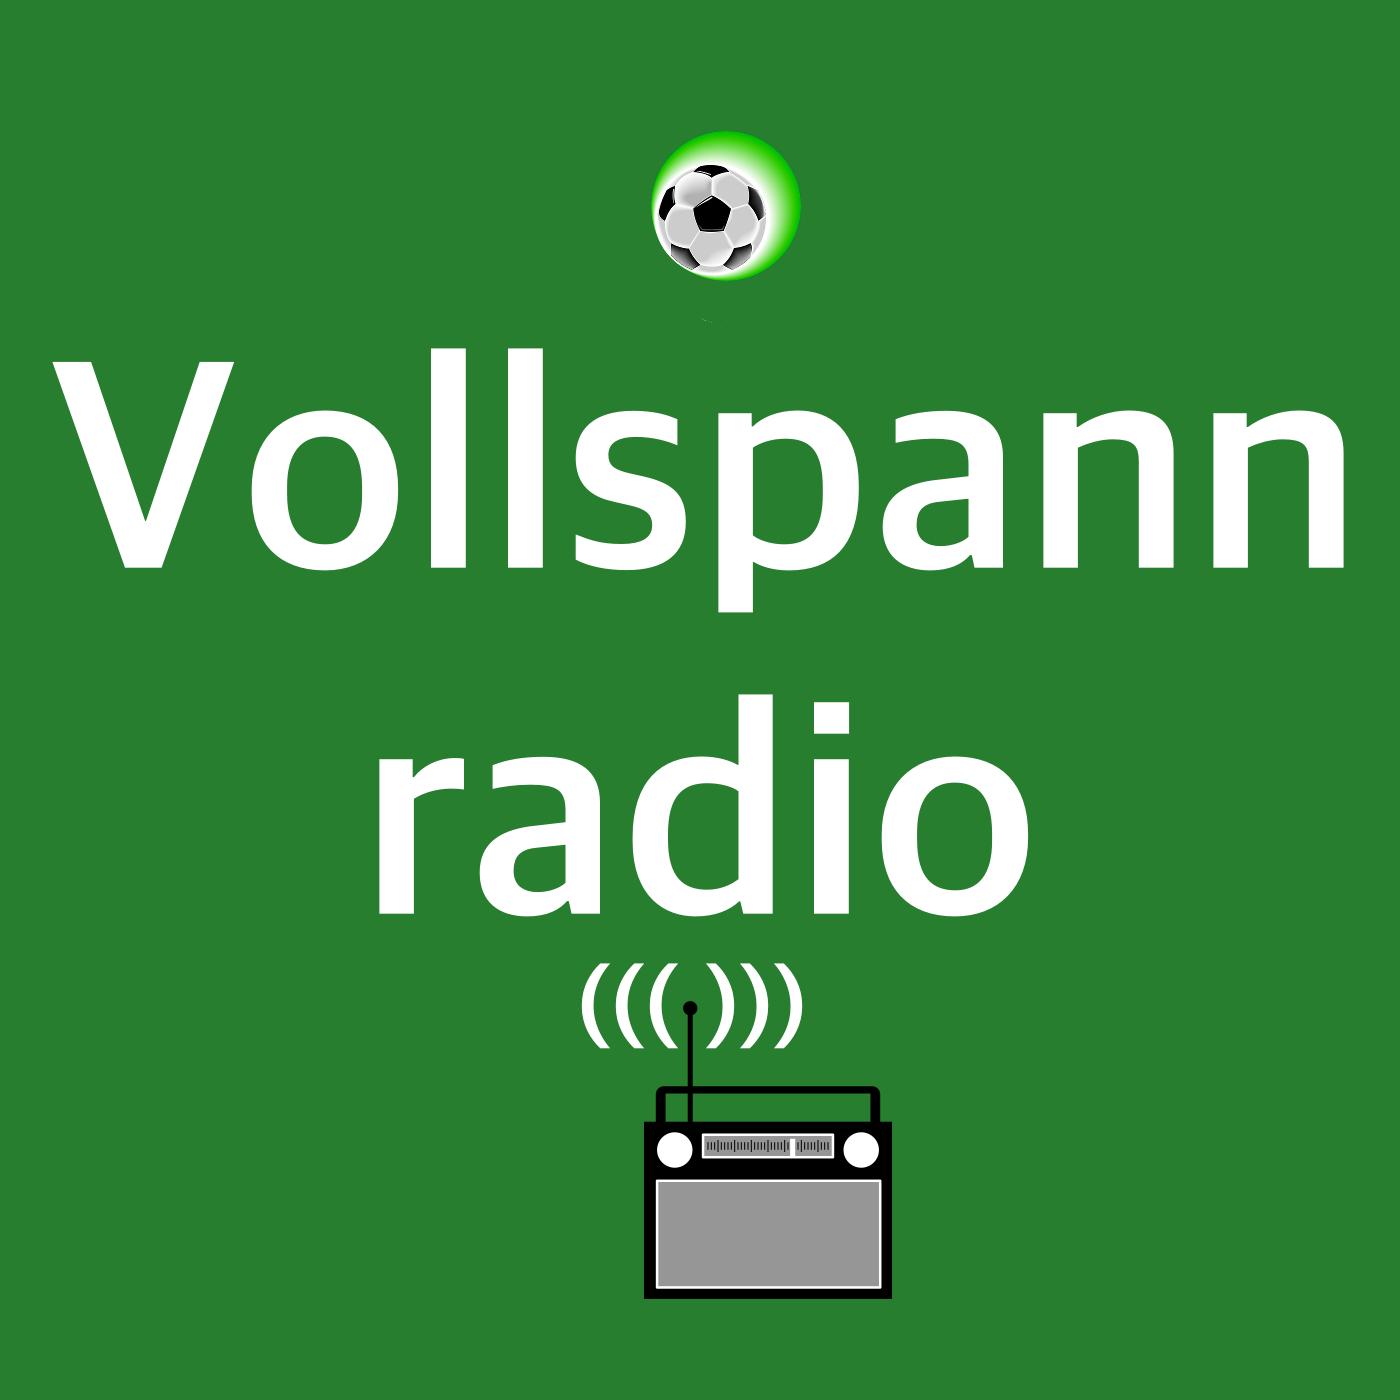 Vollspannradio